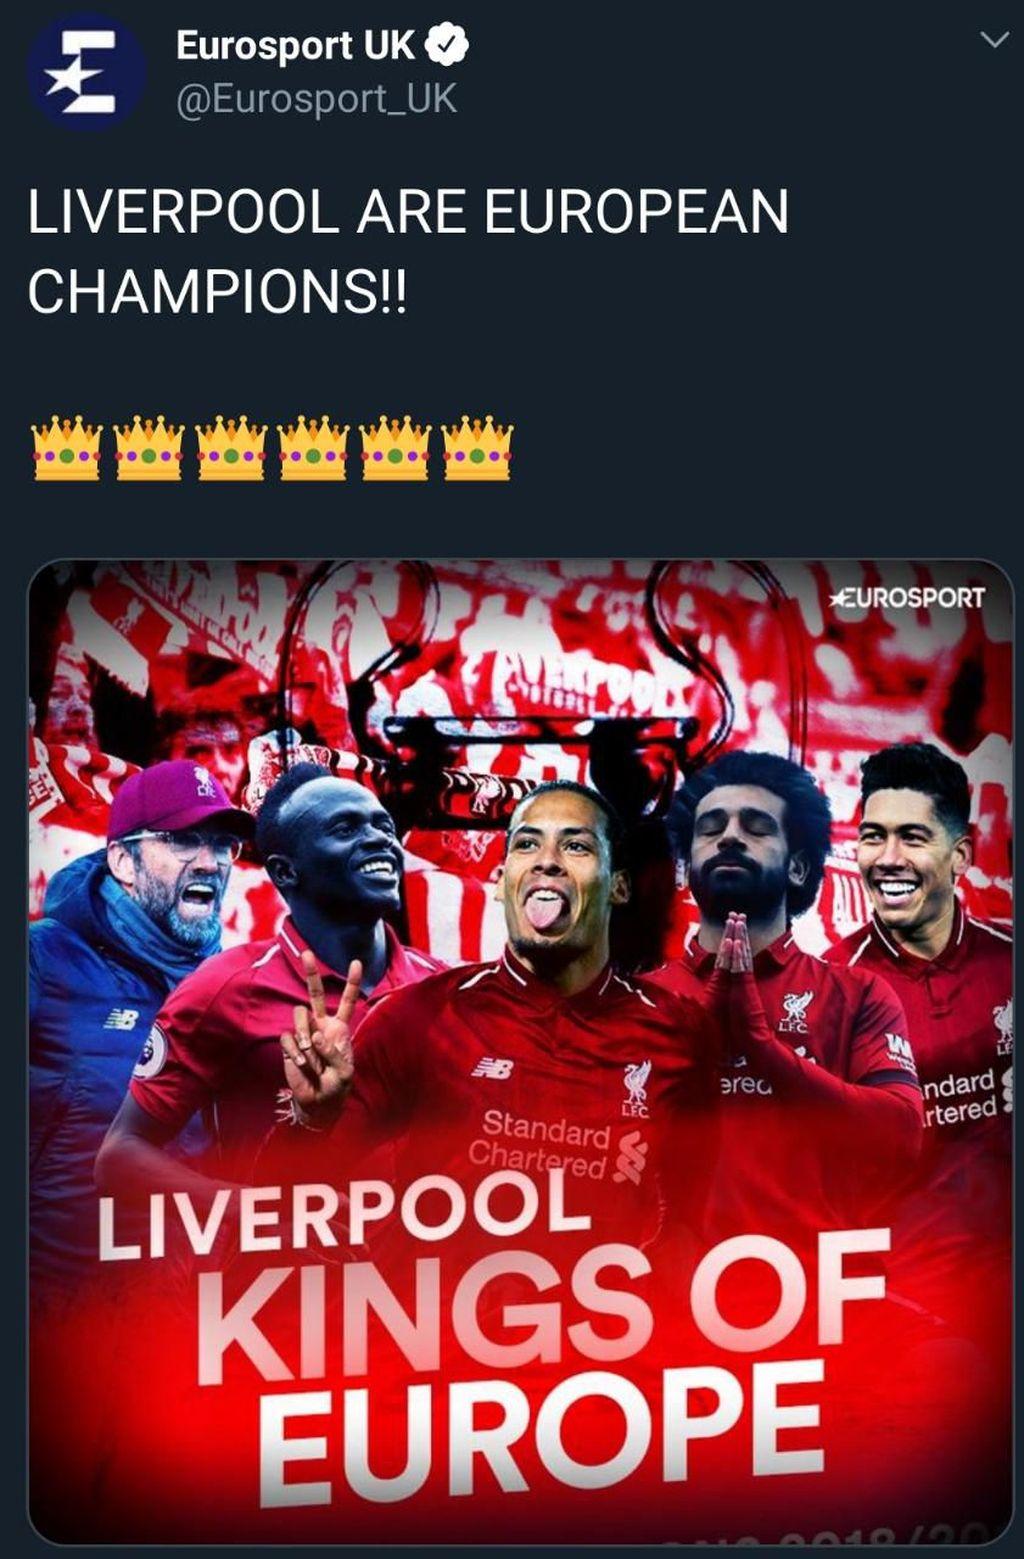 Liverpool jadi raja Eropa usai menang 2-0 atas Spurs. (Foto: Internet/Twitter)